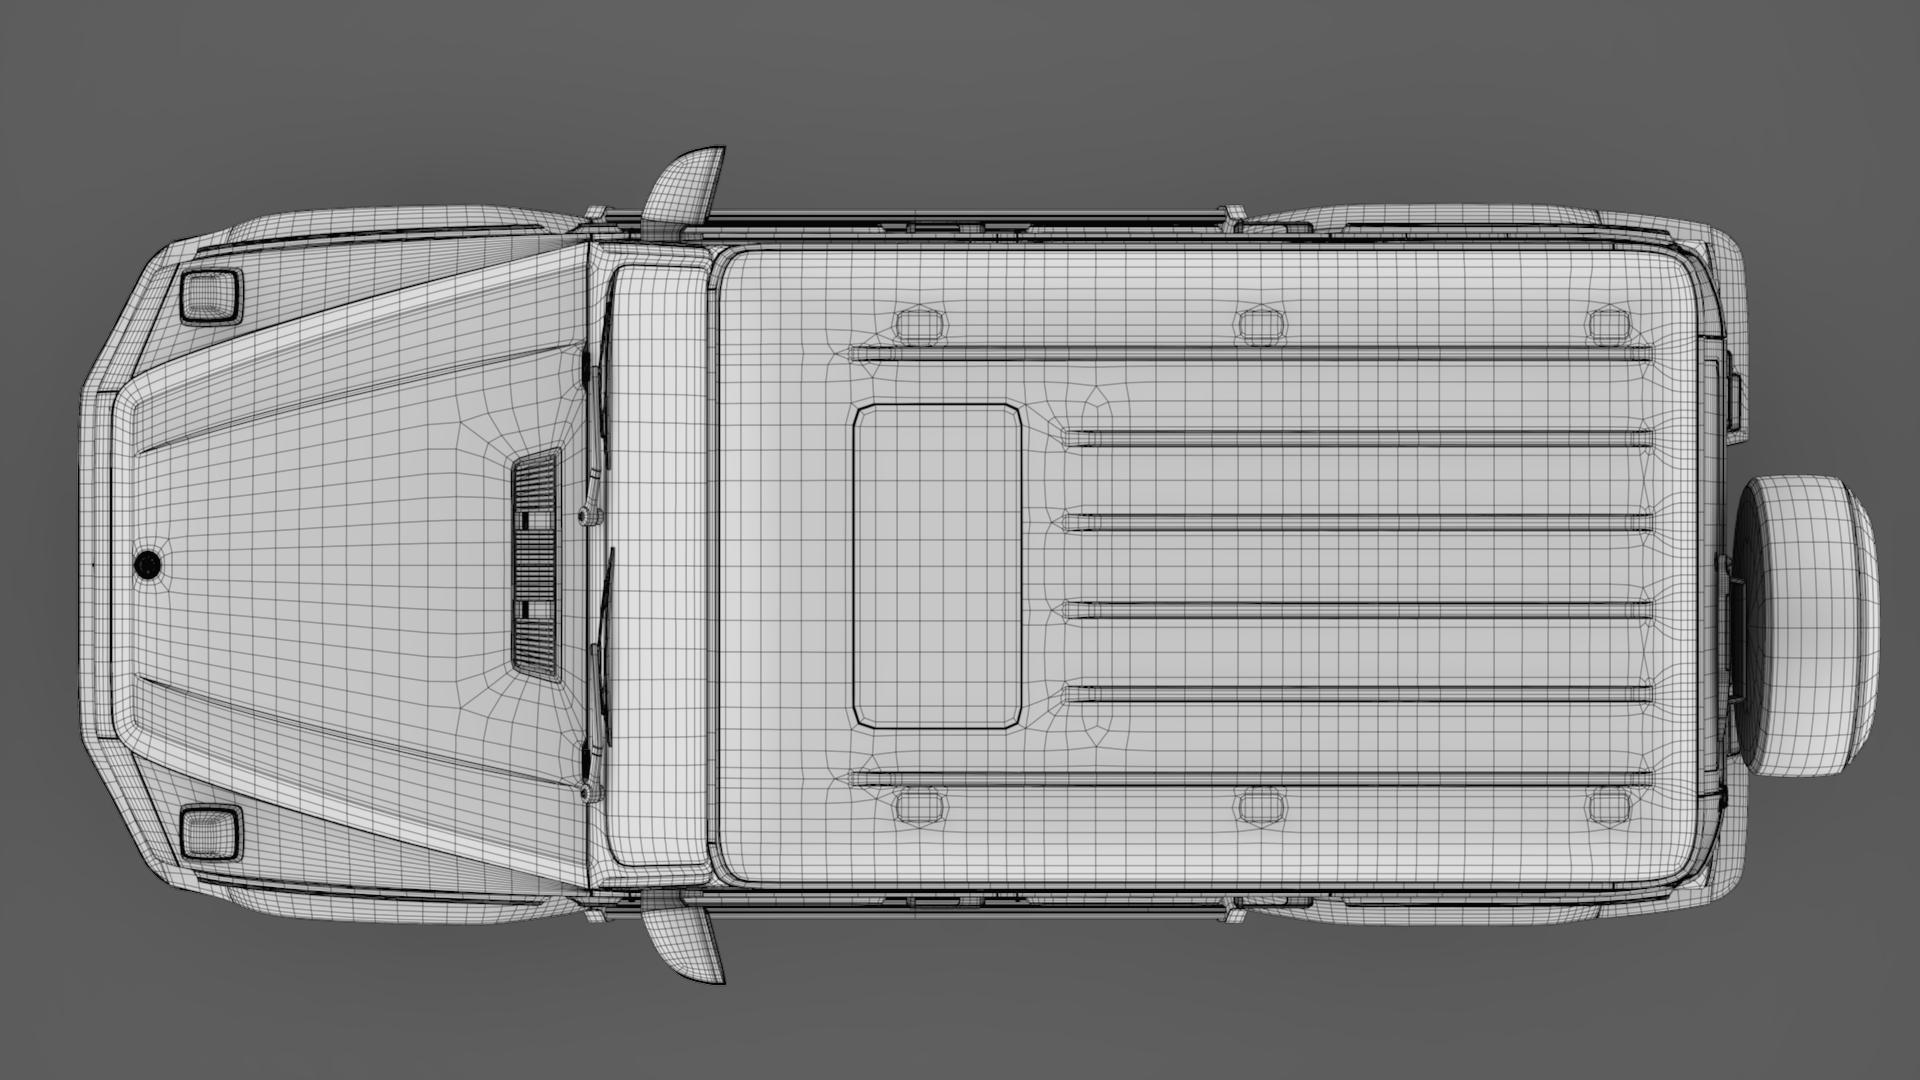 mercedes-benz g 500 (w464) 2018 3d model max fbx c4d lwo ma mb hrc xsi obj 277646